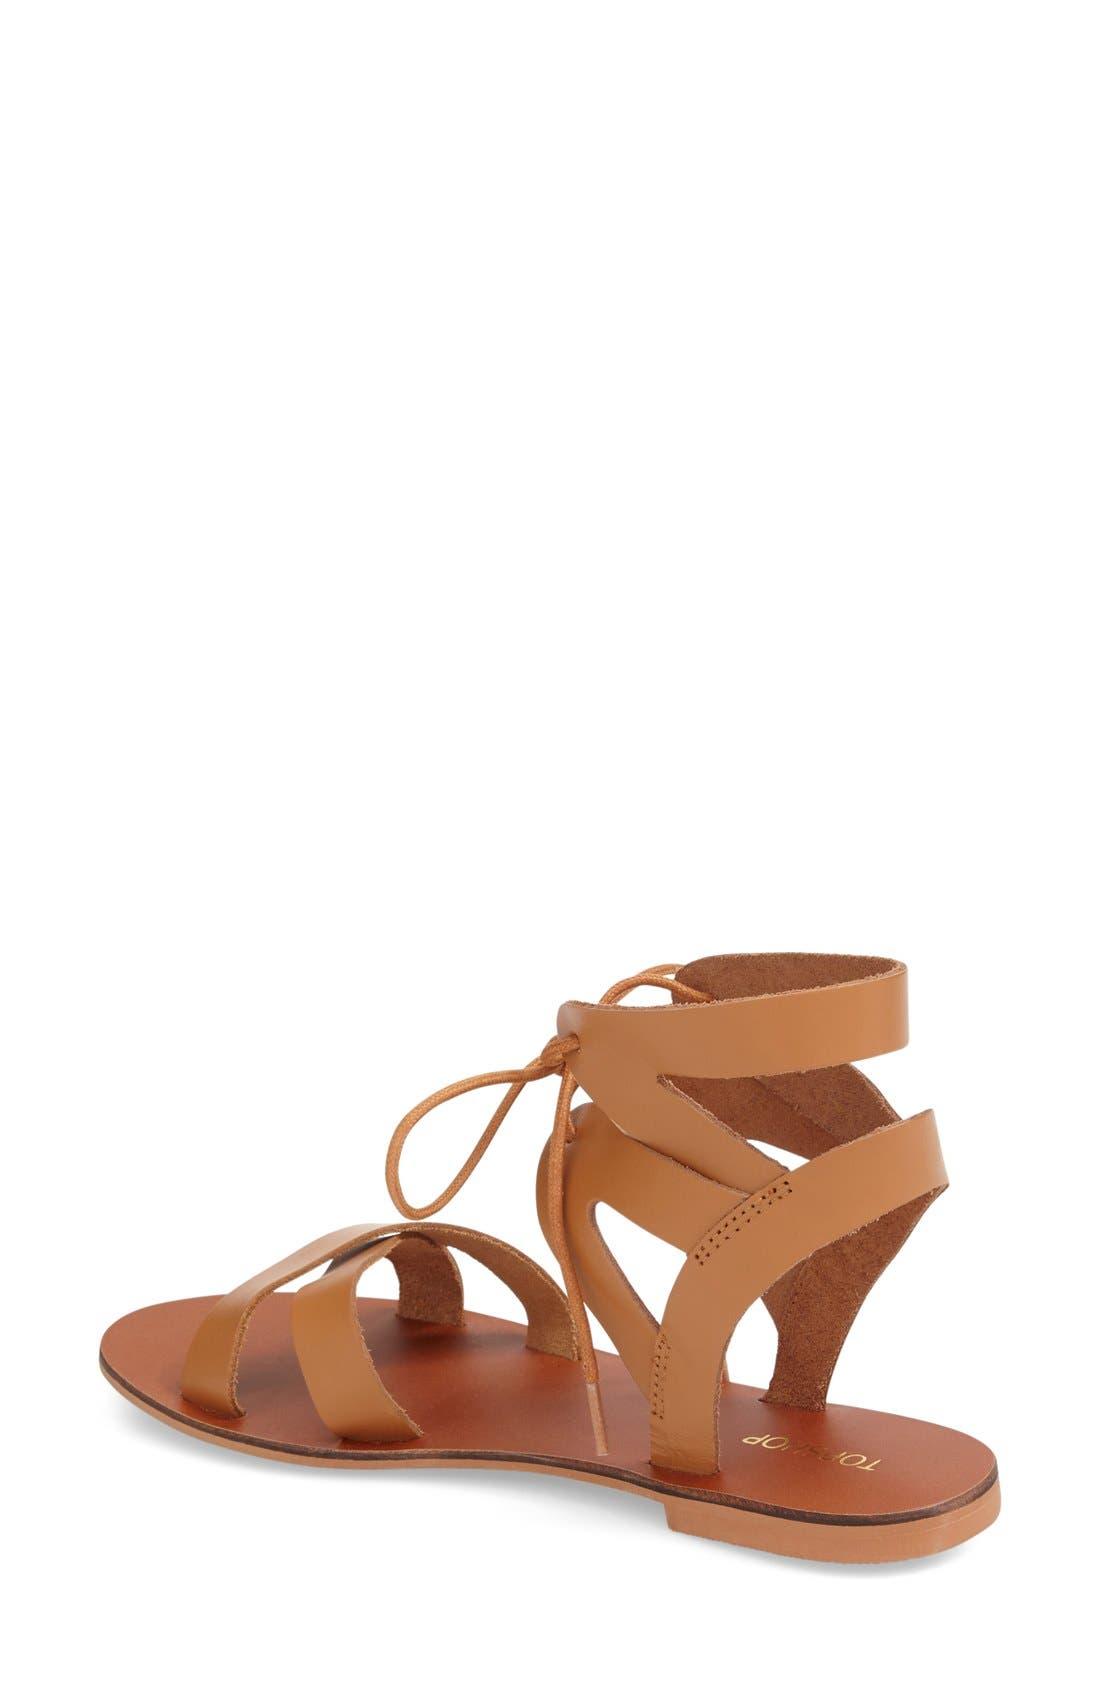 'Herb' Lace-Up Flat Sandal,                             Alternate thumbnail 3, color,